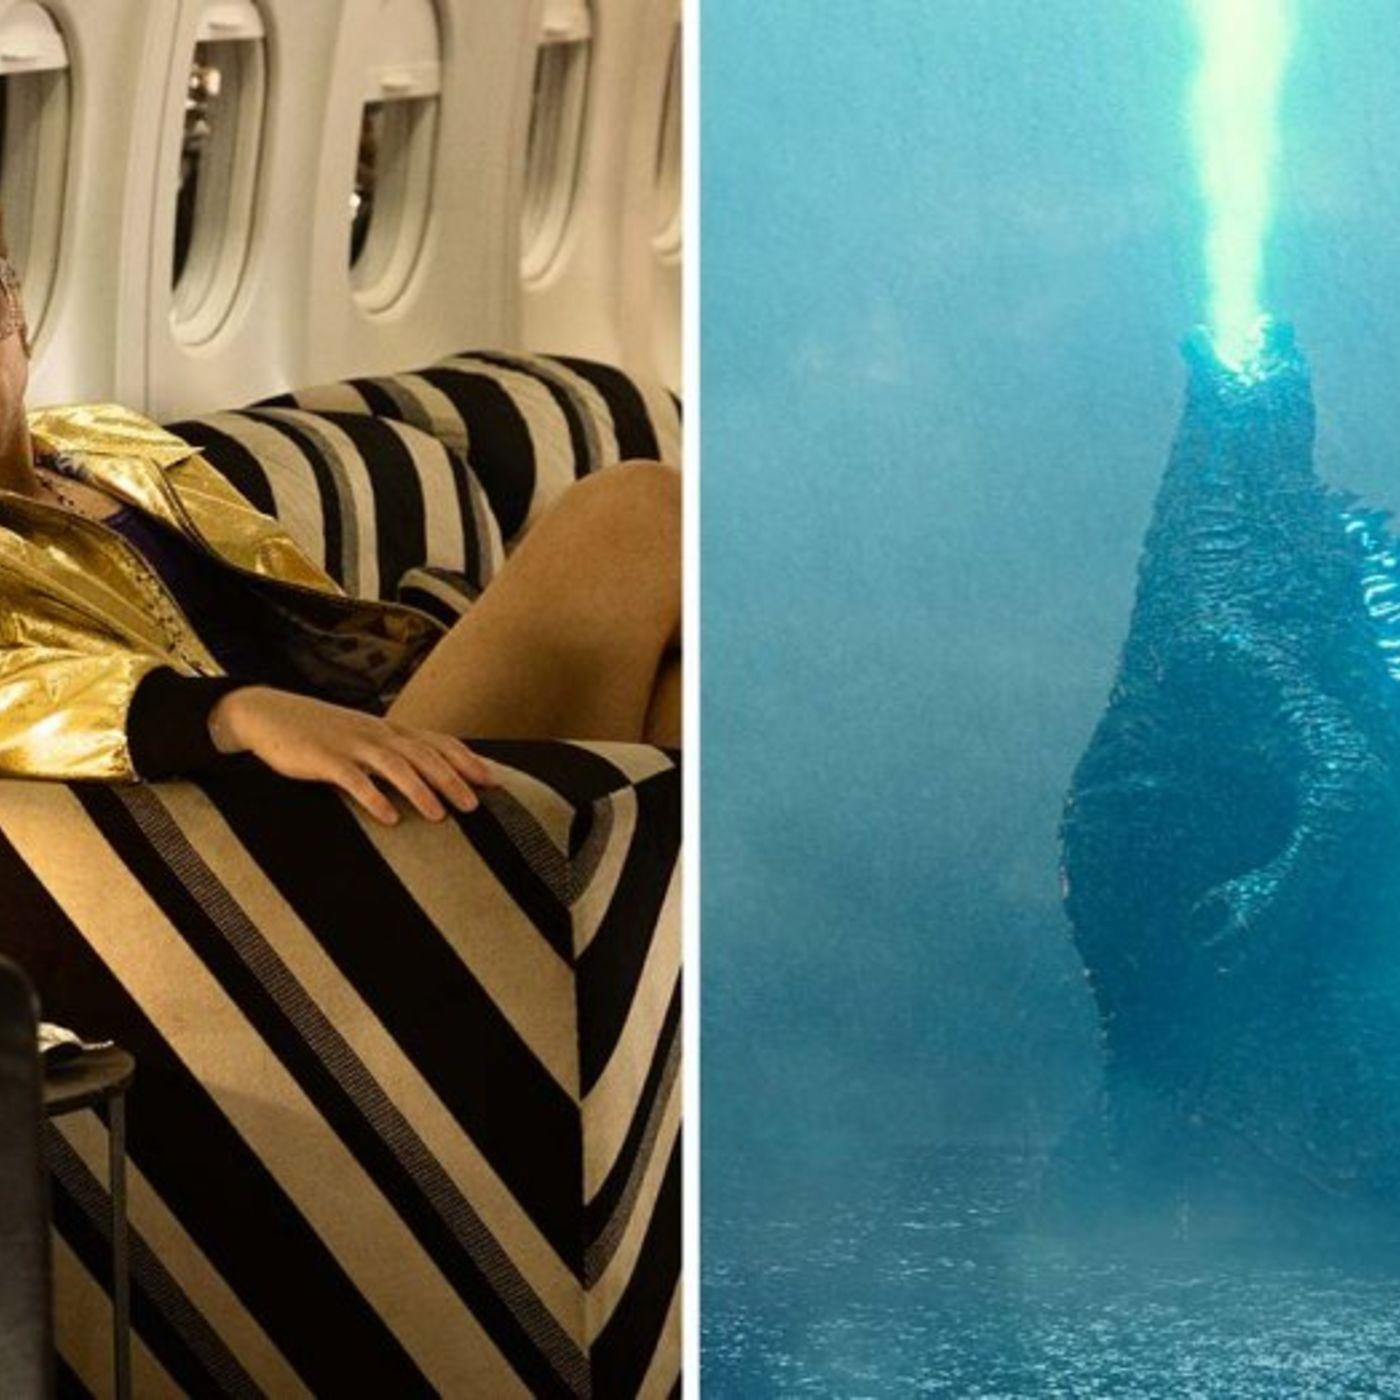 Episode 22 - Godzilla vs. Rocketman